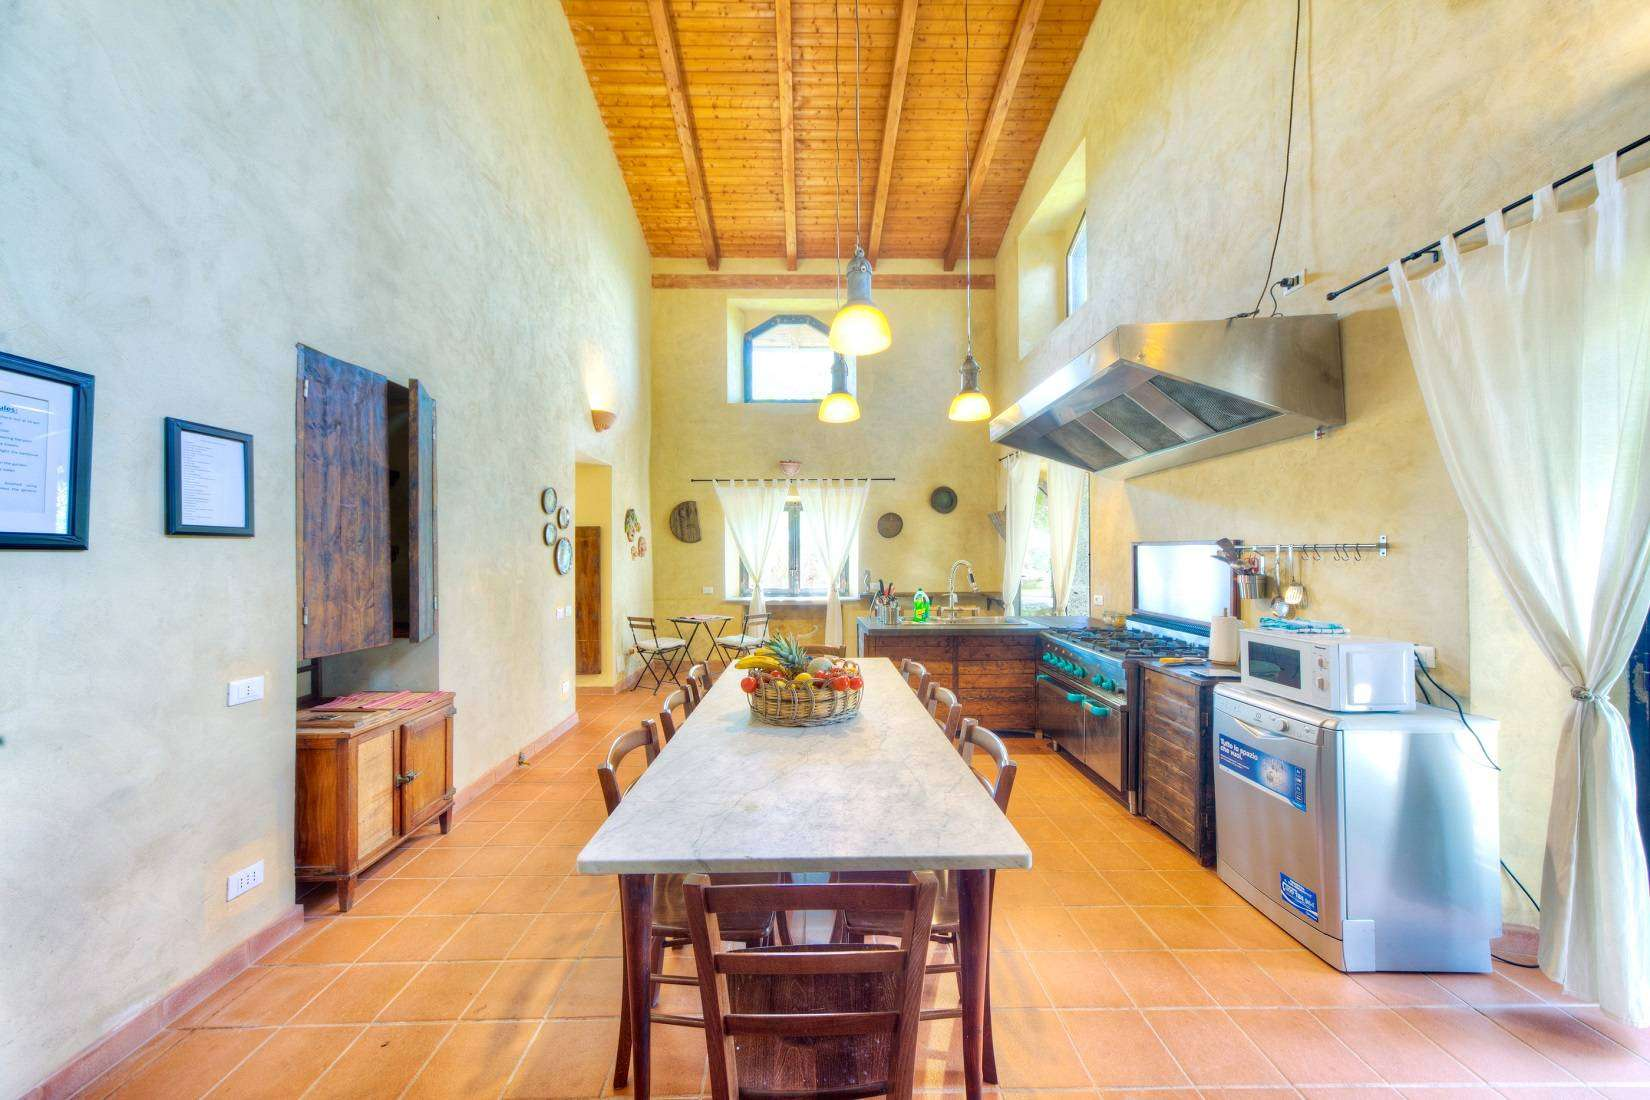 5 Rustica Dining Room